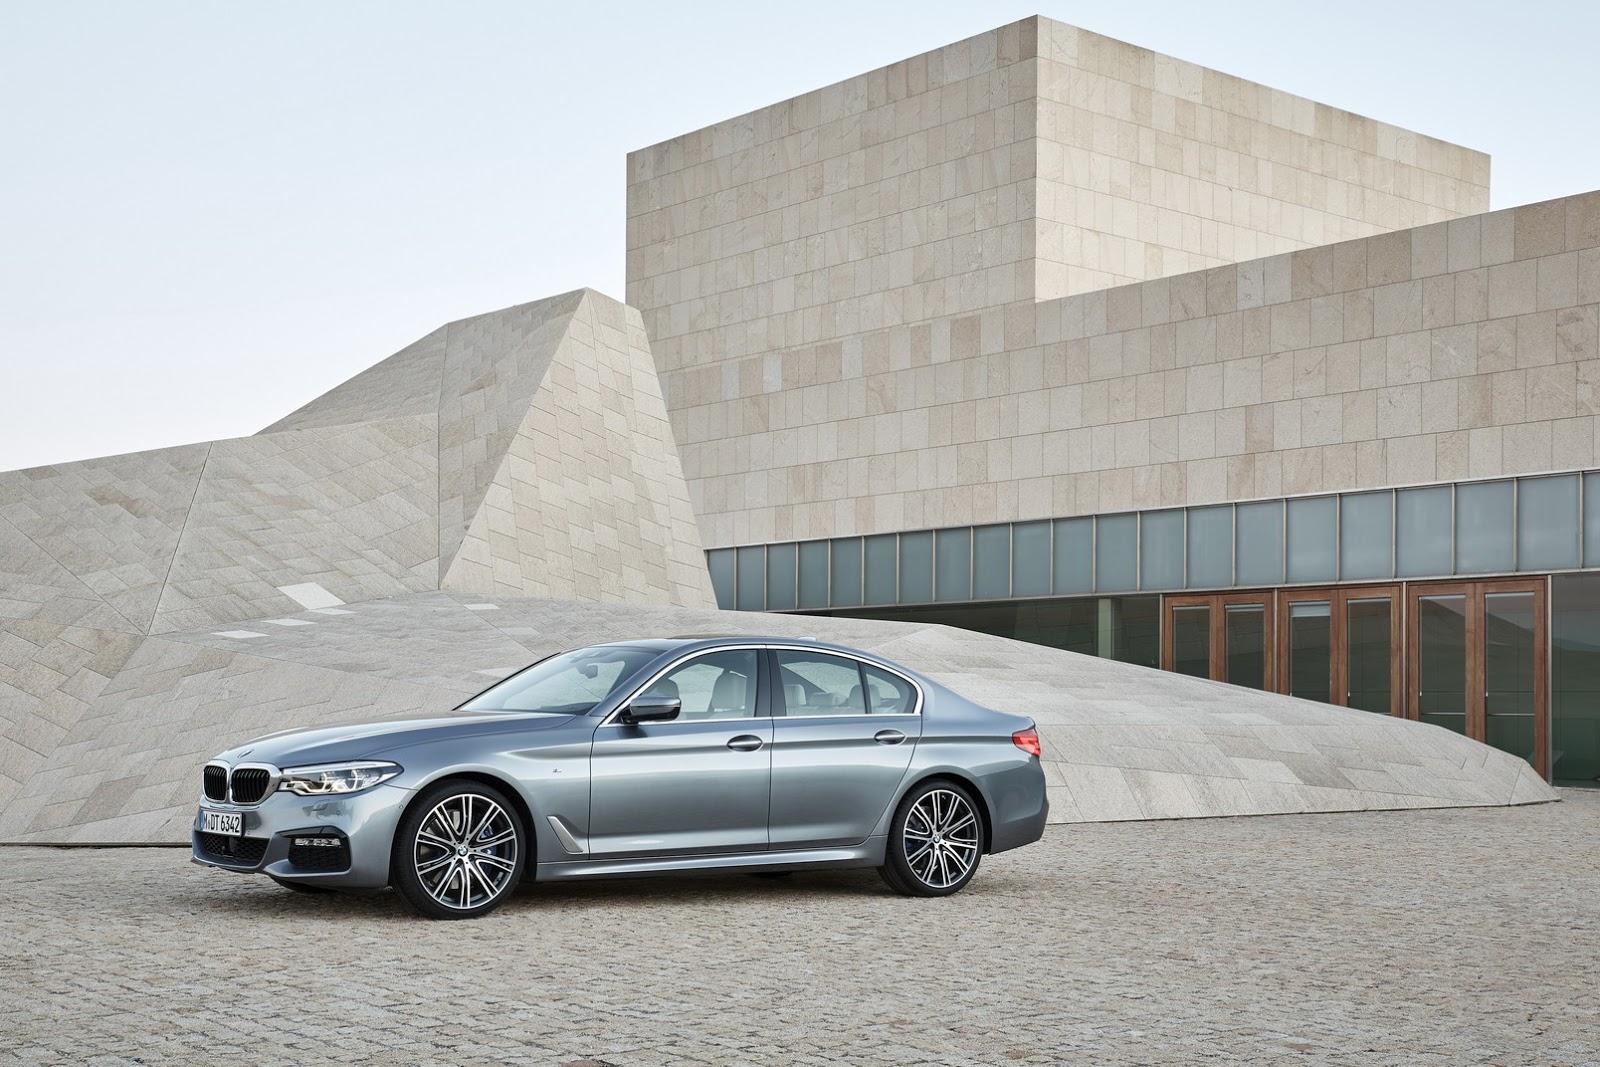 2017-BMW-5-Series-23.jpg